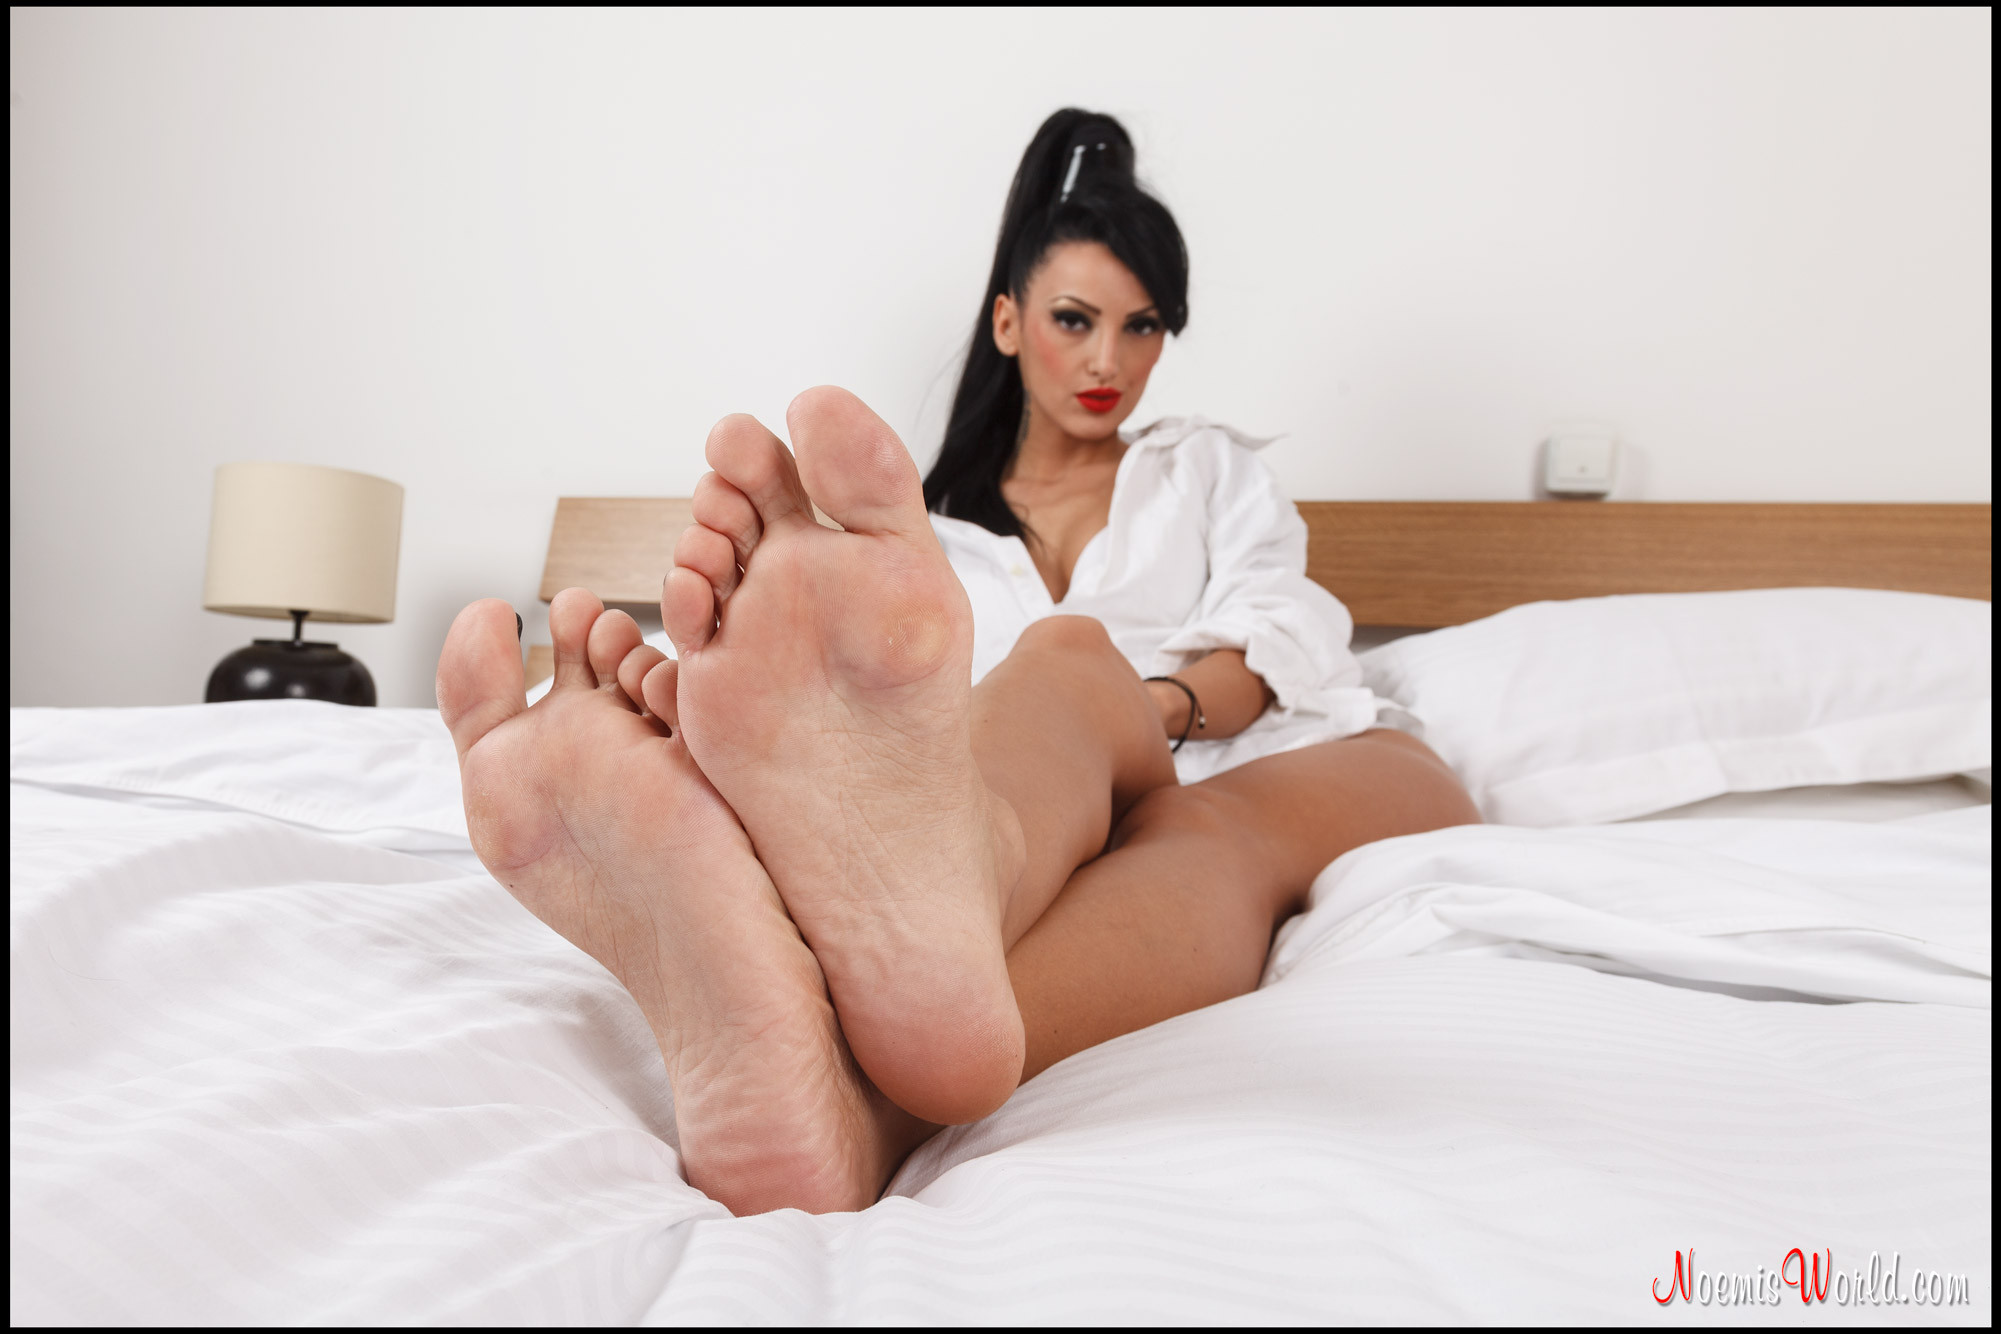 Lebanese girls feet pics #11